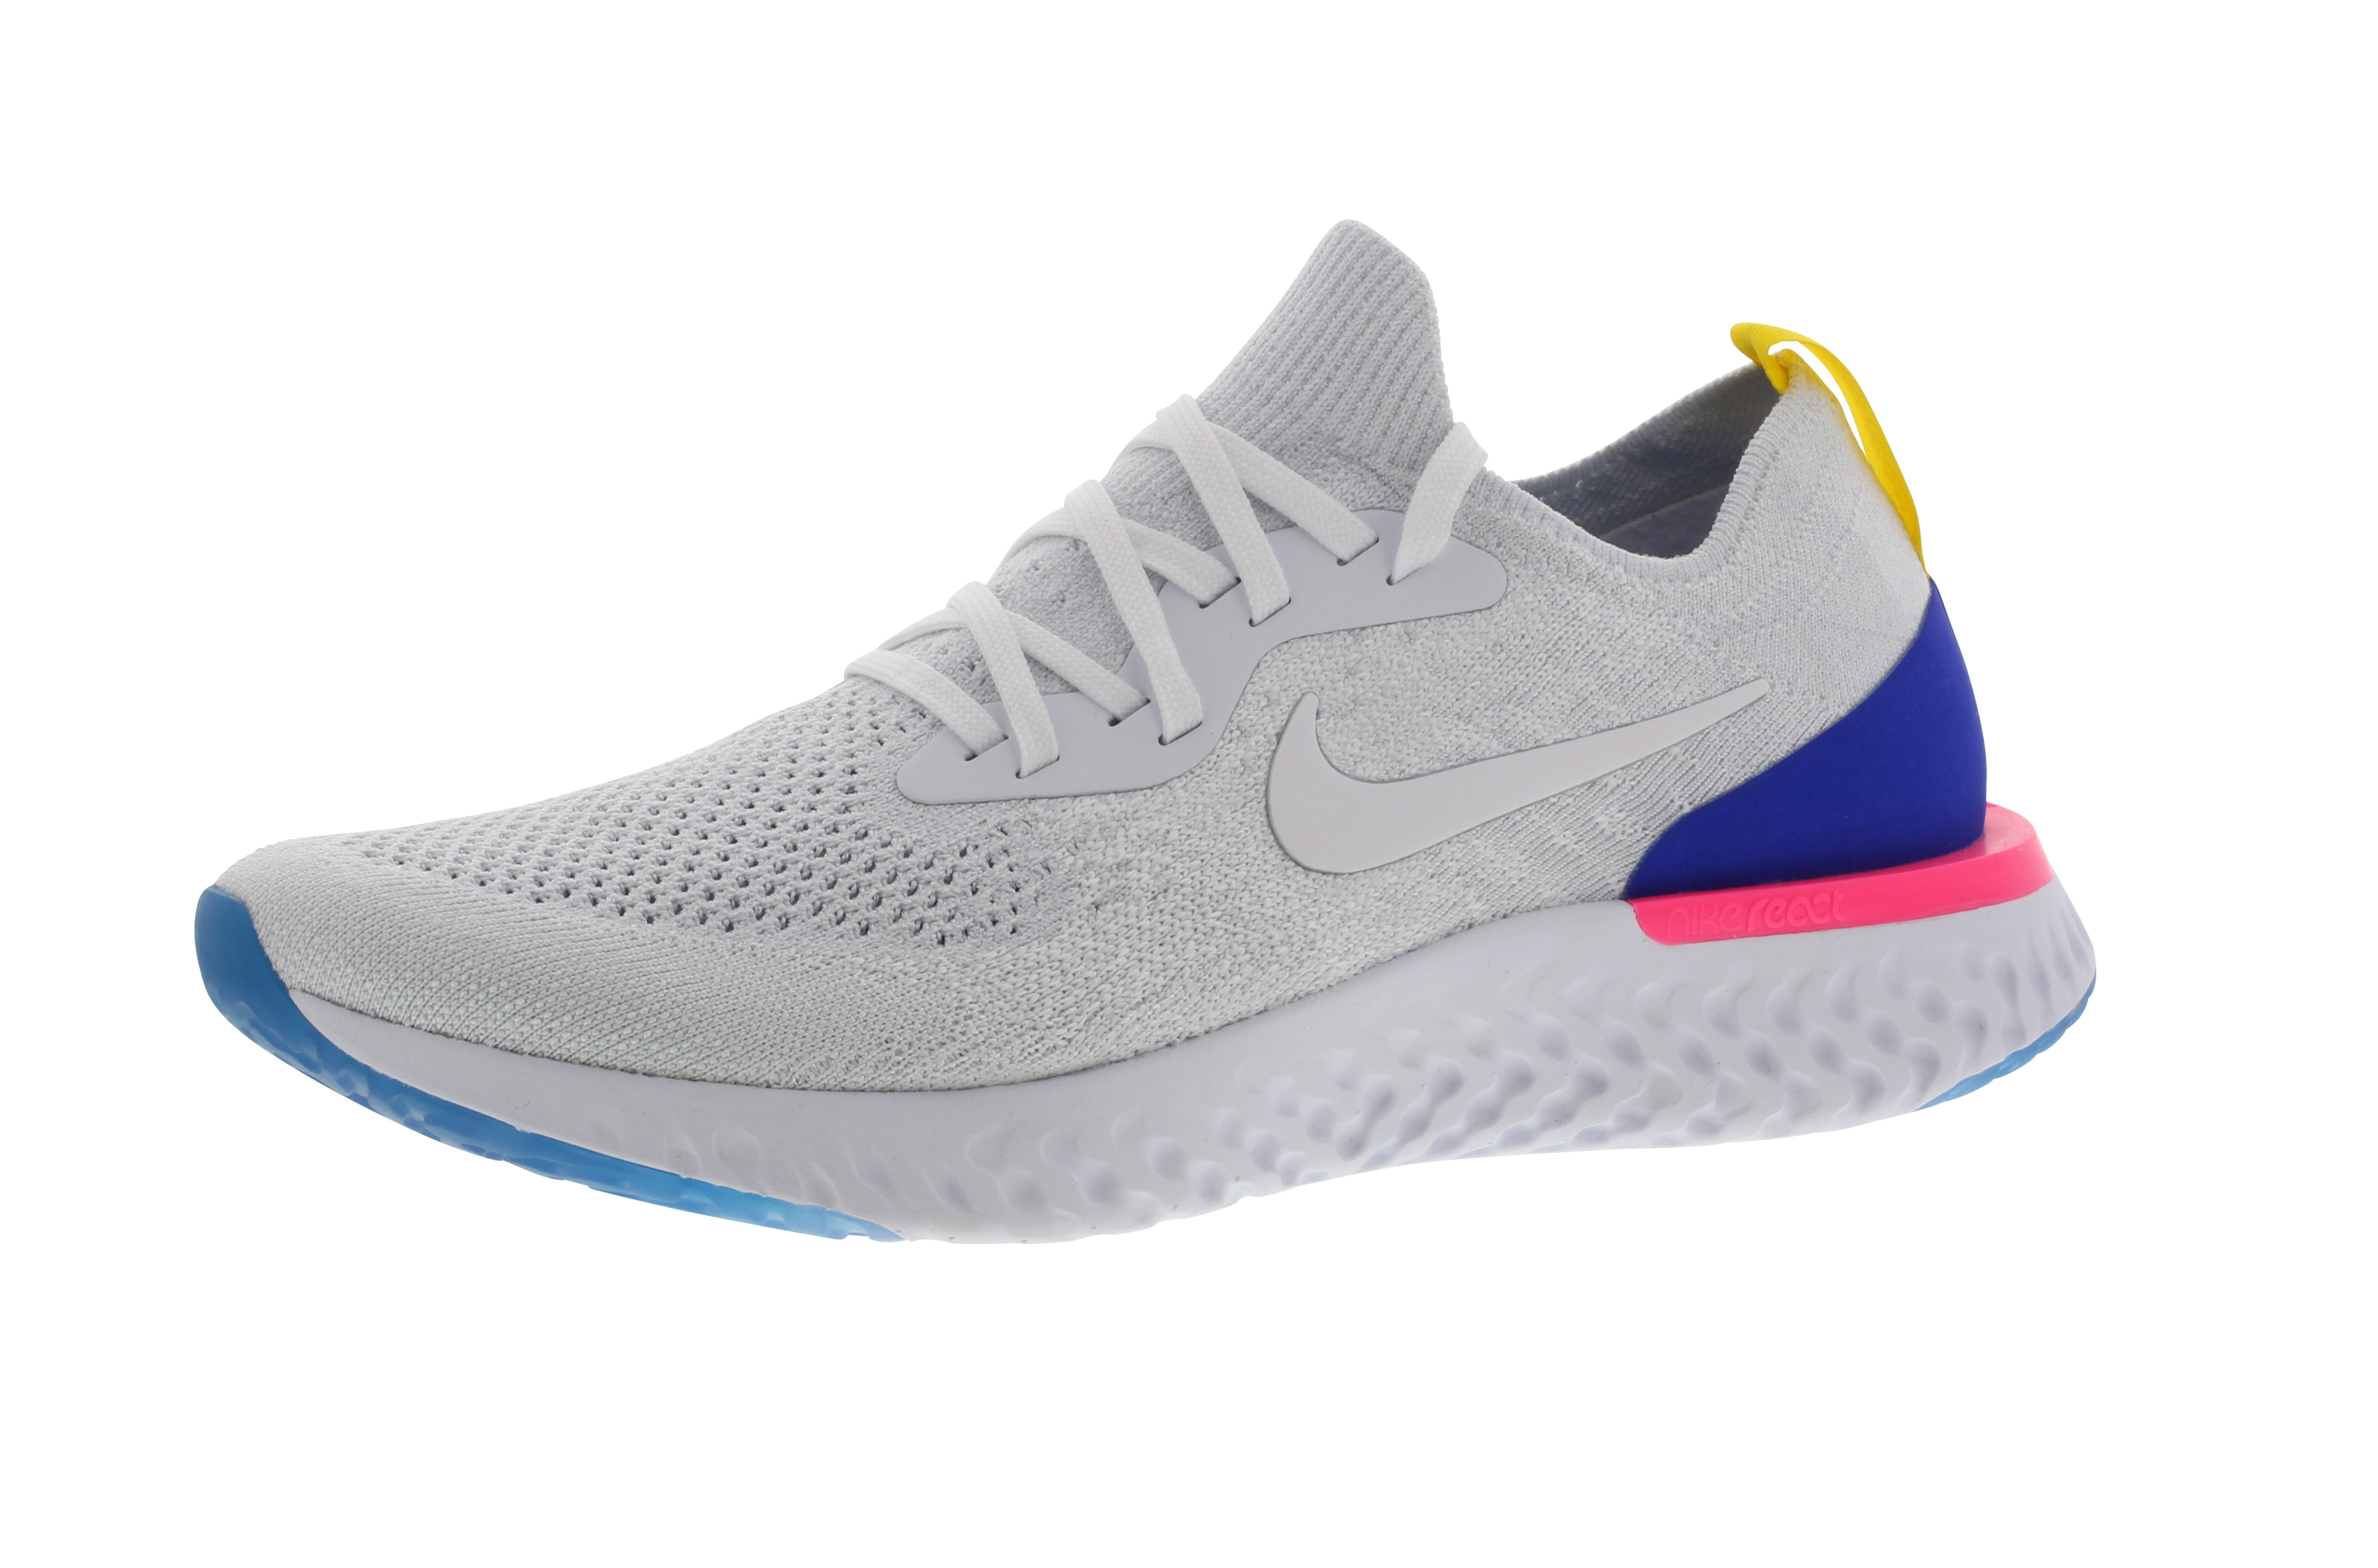 Nike Epic React Flyknit - Laufschuhe für Damen - Weiß